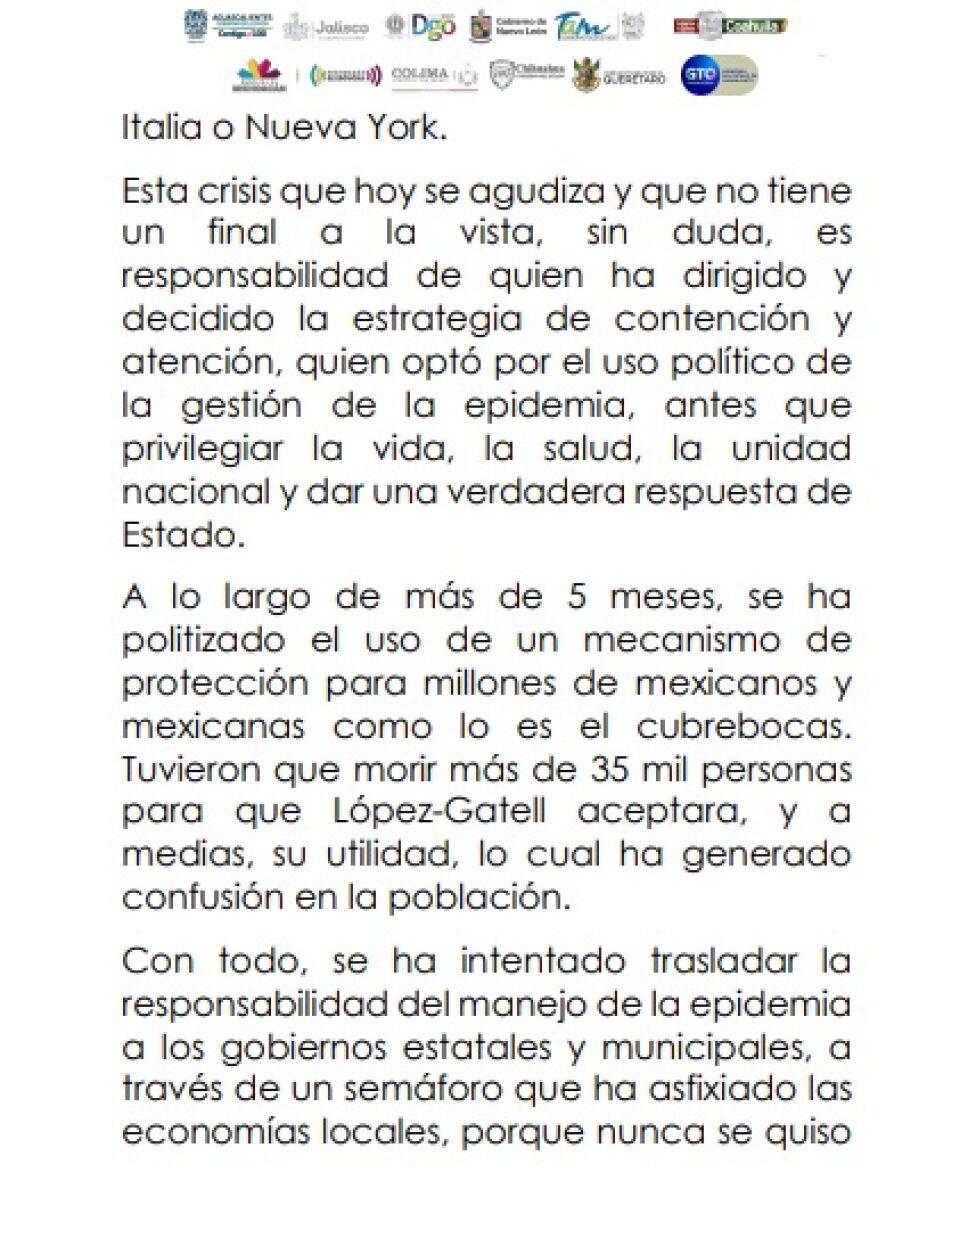 Exigen gobernadores renuncia inmediata de López-Gatell (3)